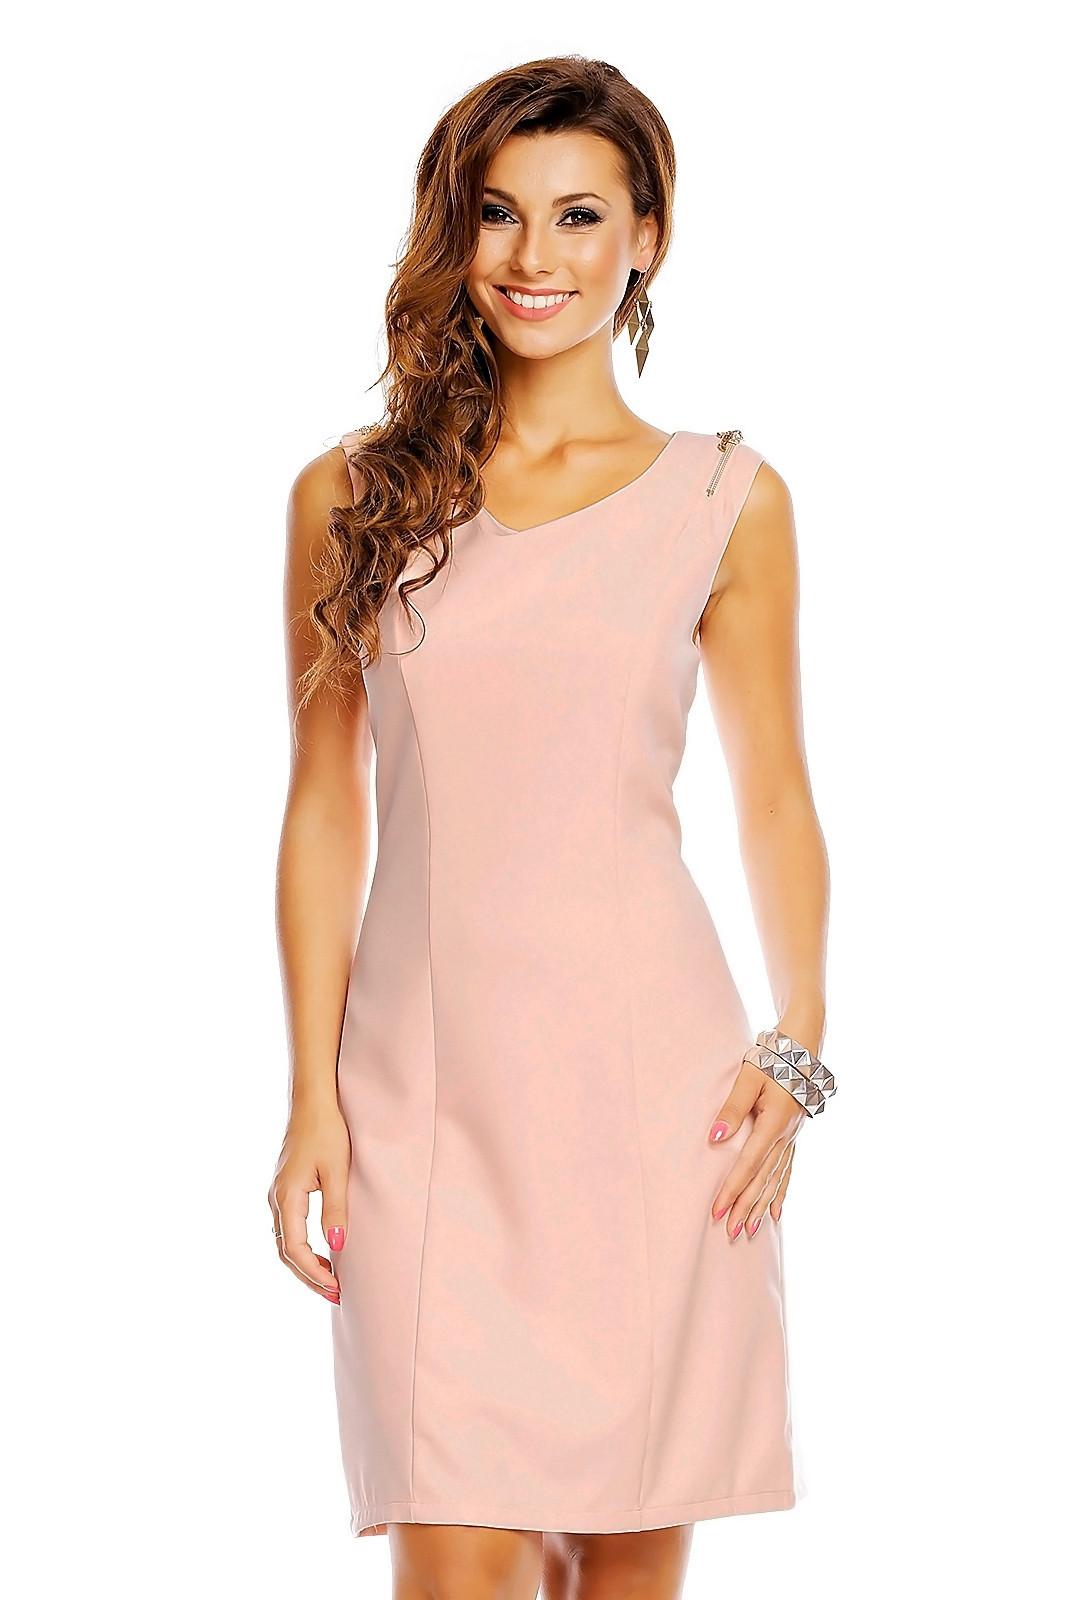 Spoločenské šaty značkové moderný strih s ozdobnými zipsami na ramenách ružové - Ružová / XL - J & J lososová XL